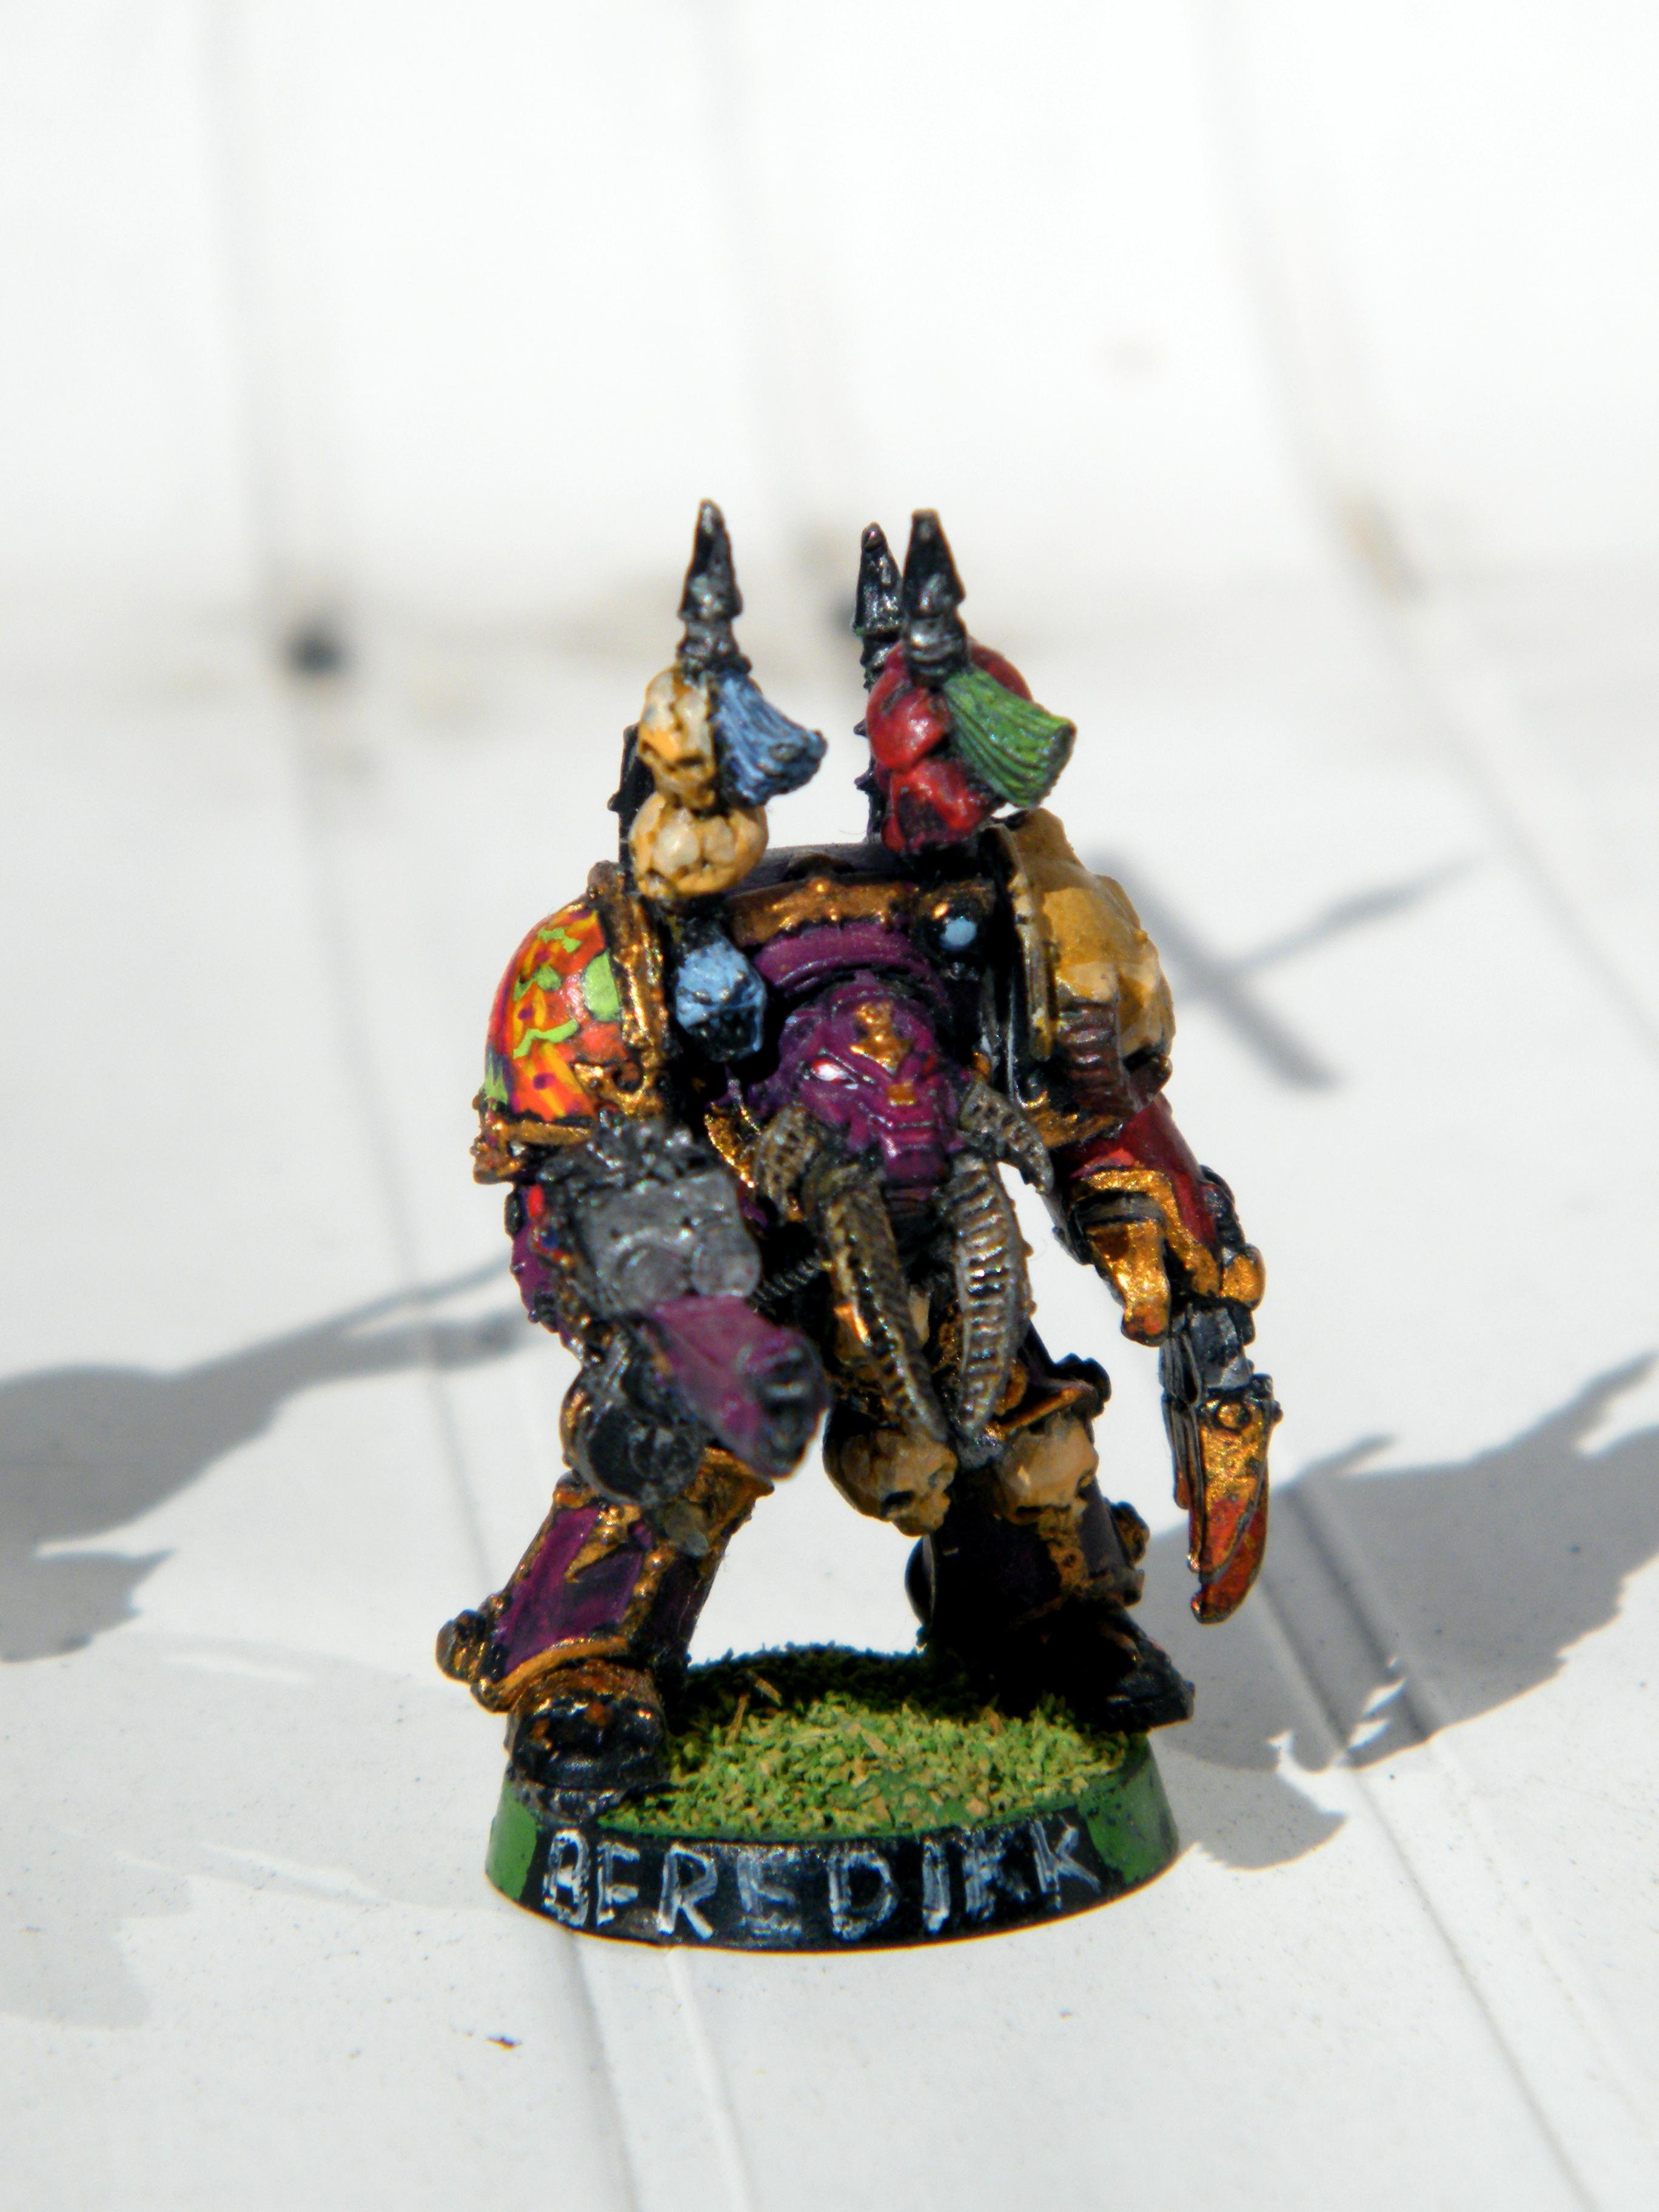 Champion, Chaos, Chaos Space Marines, Emperor's Children, Slaanesh, Warhammer 40,000